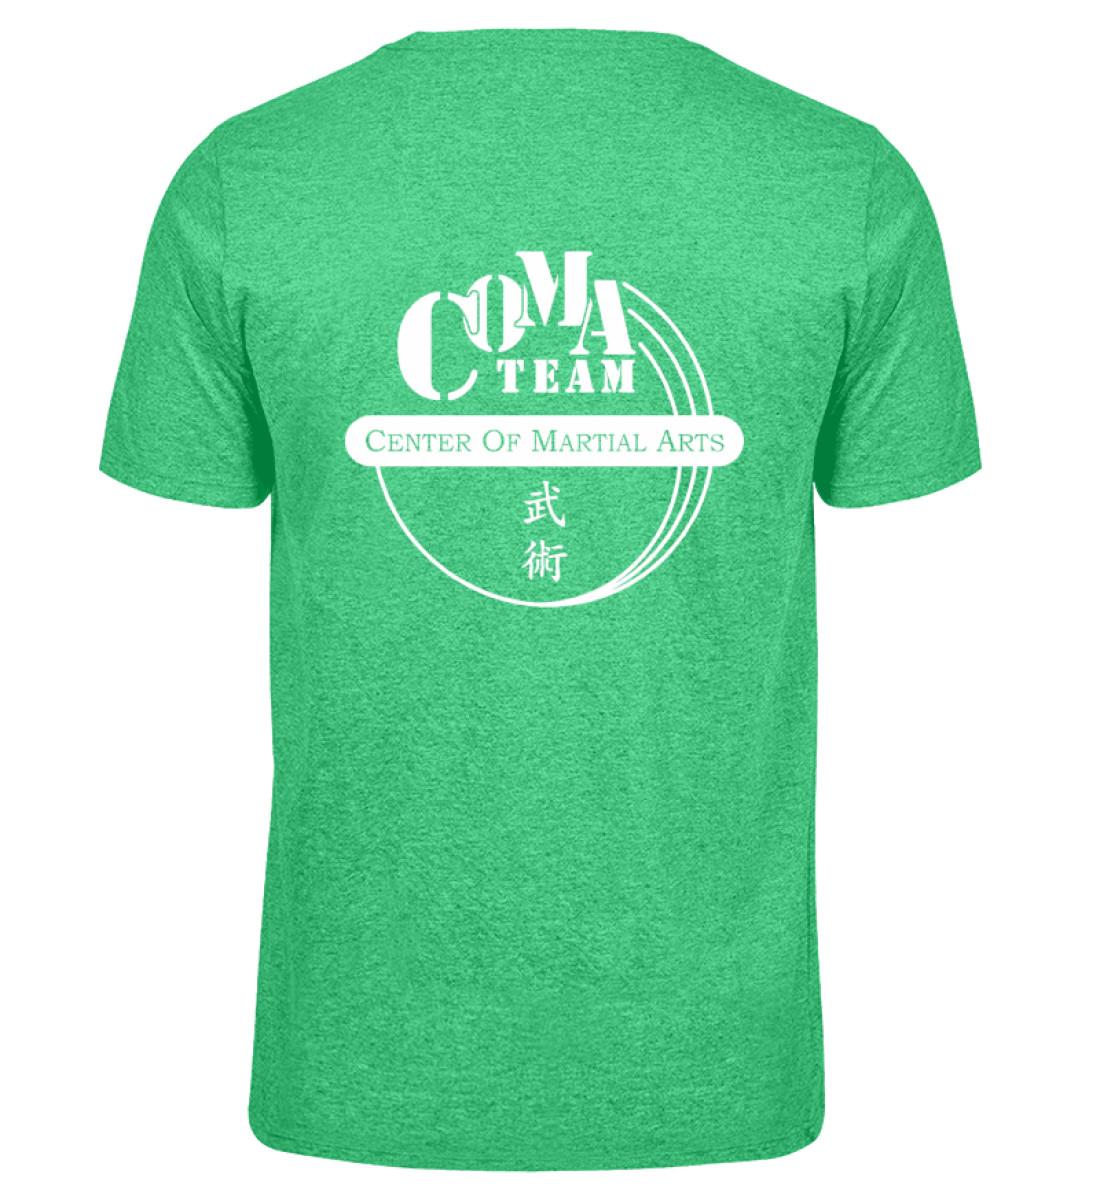 COMA Team - Herren Melange Shirt-6804